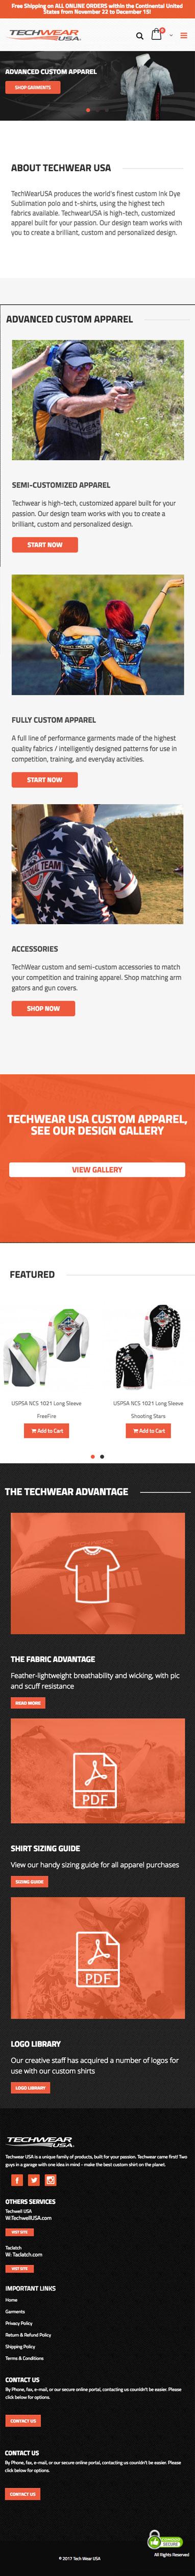 https://s3.amazonaws.com/logicwebmedia/wp-content/uploads/20180417191112/techwear-mobile.jpg